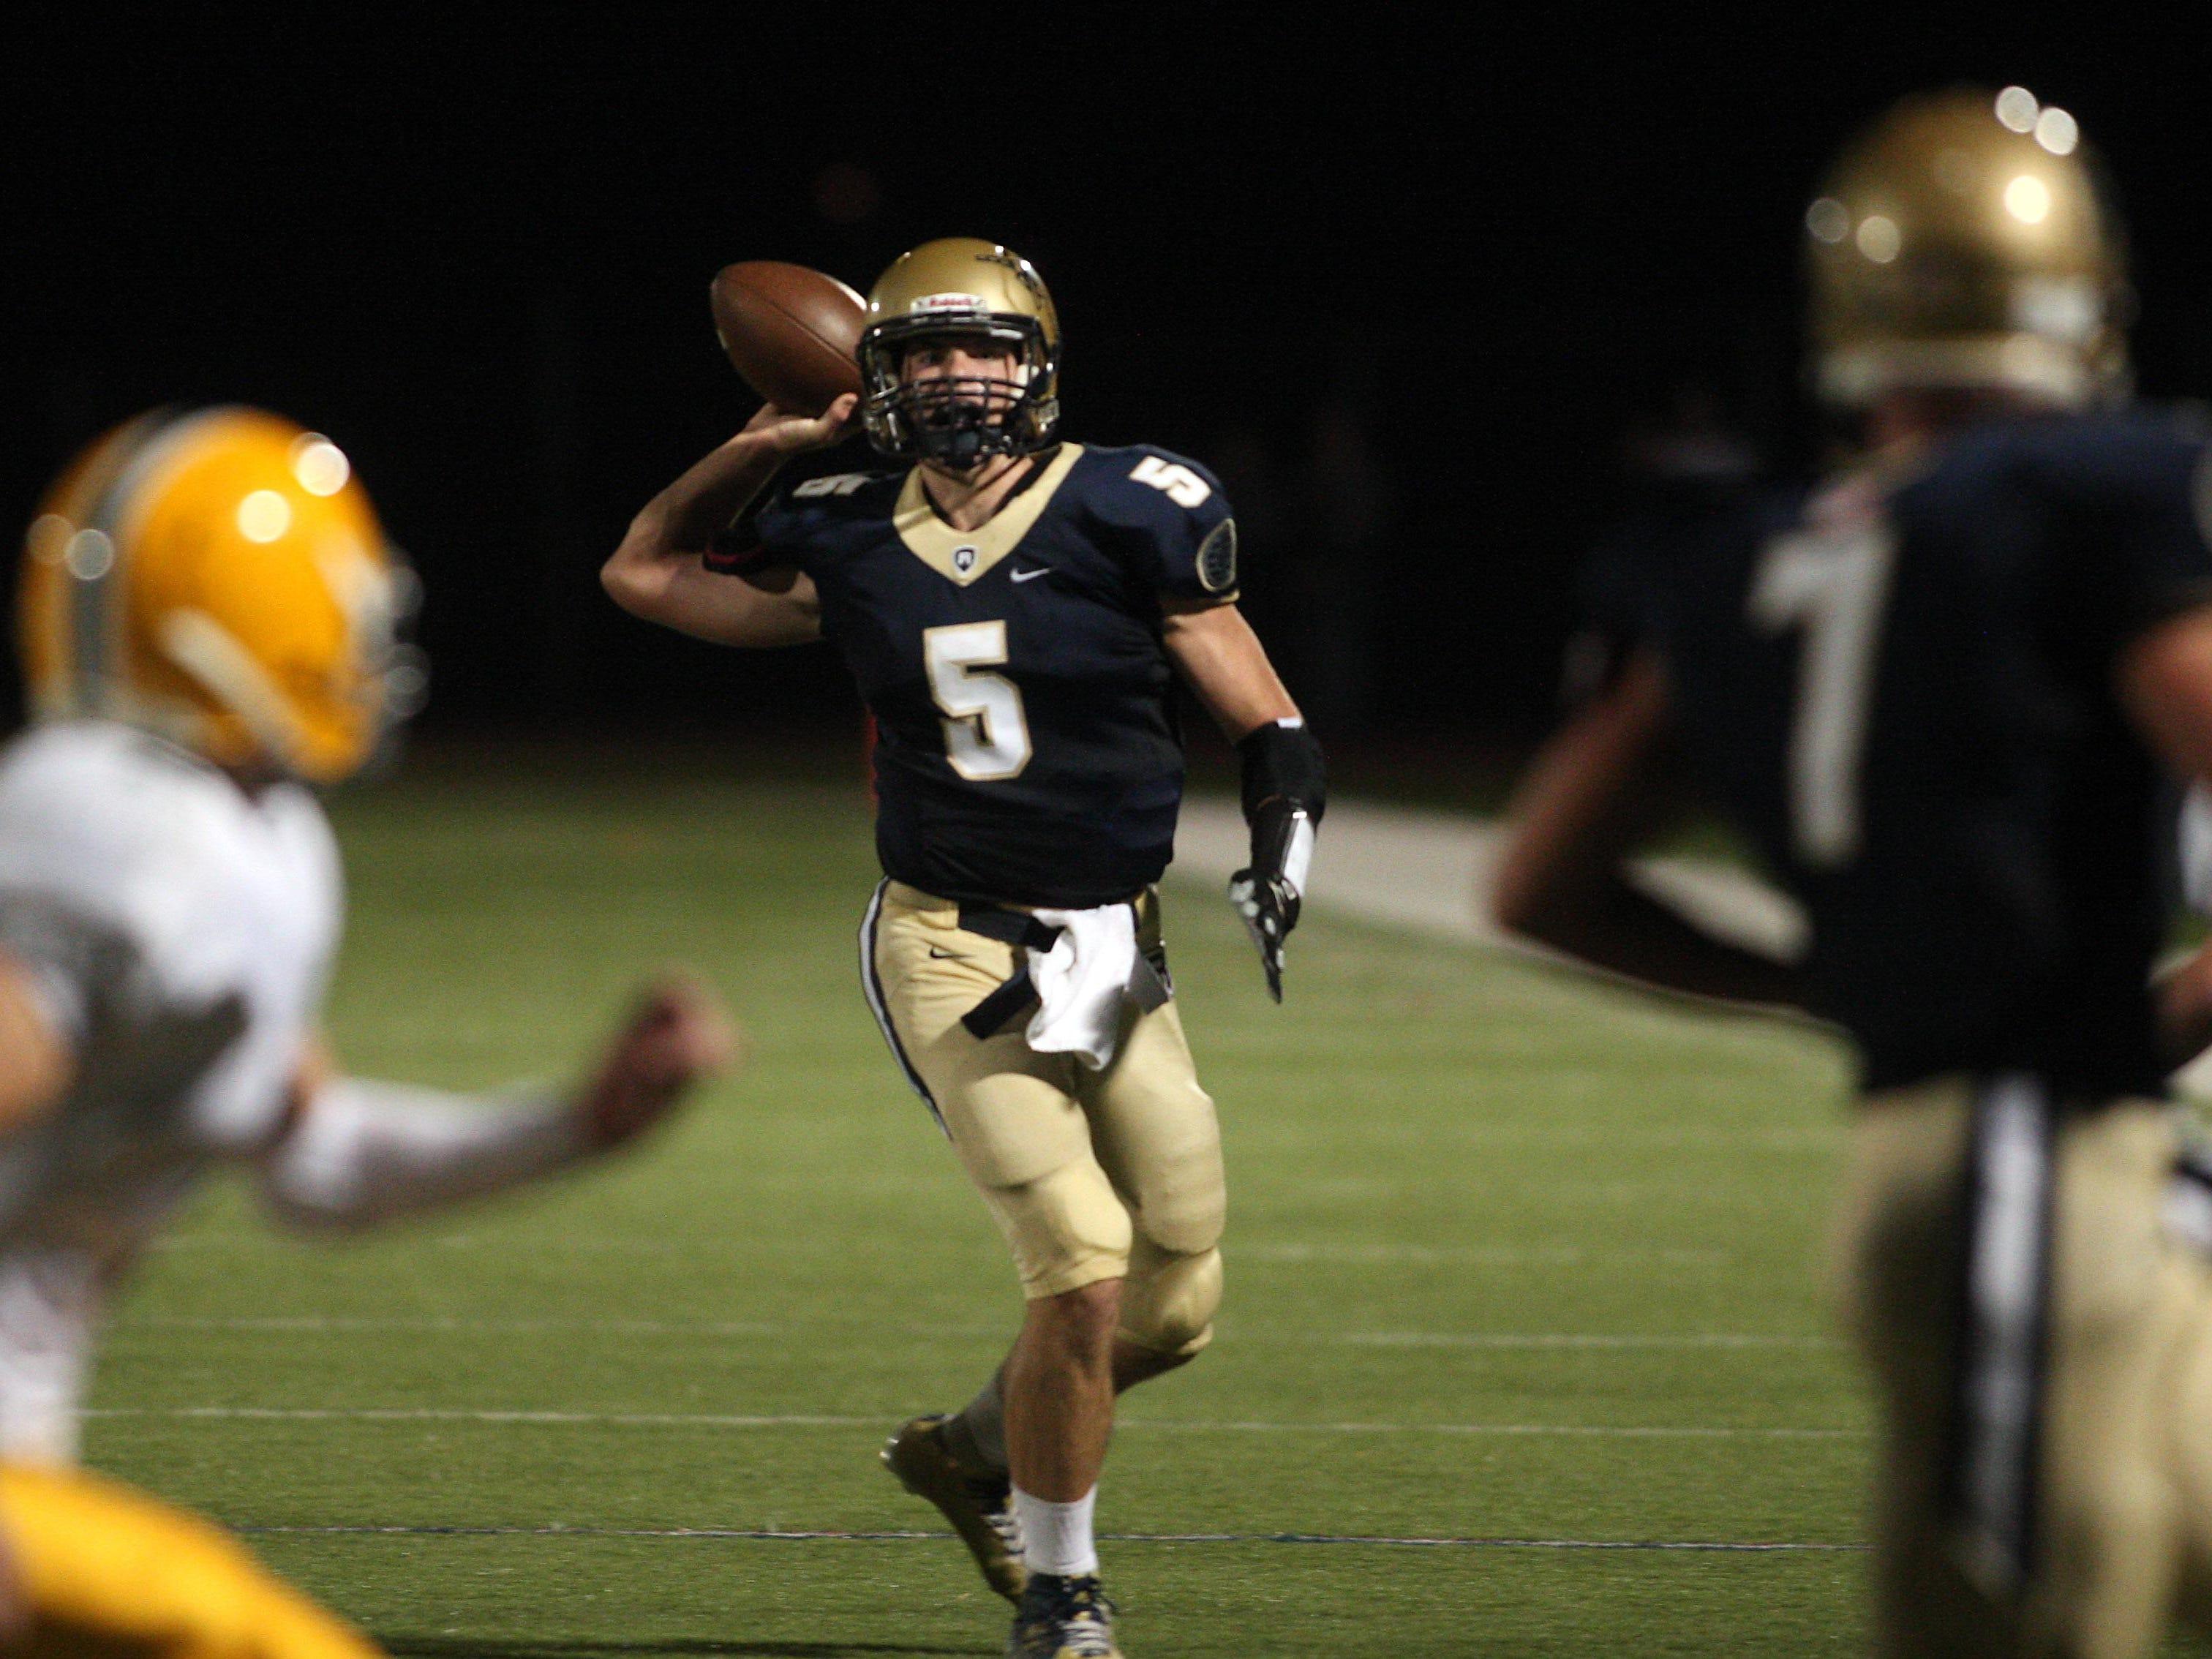 Roxbury quarterback Grant Dixon throws vs Morris Knolls during their football Friday night matchup. September 25, 2015, Roxbury, NJ.